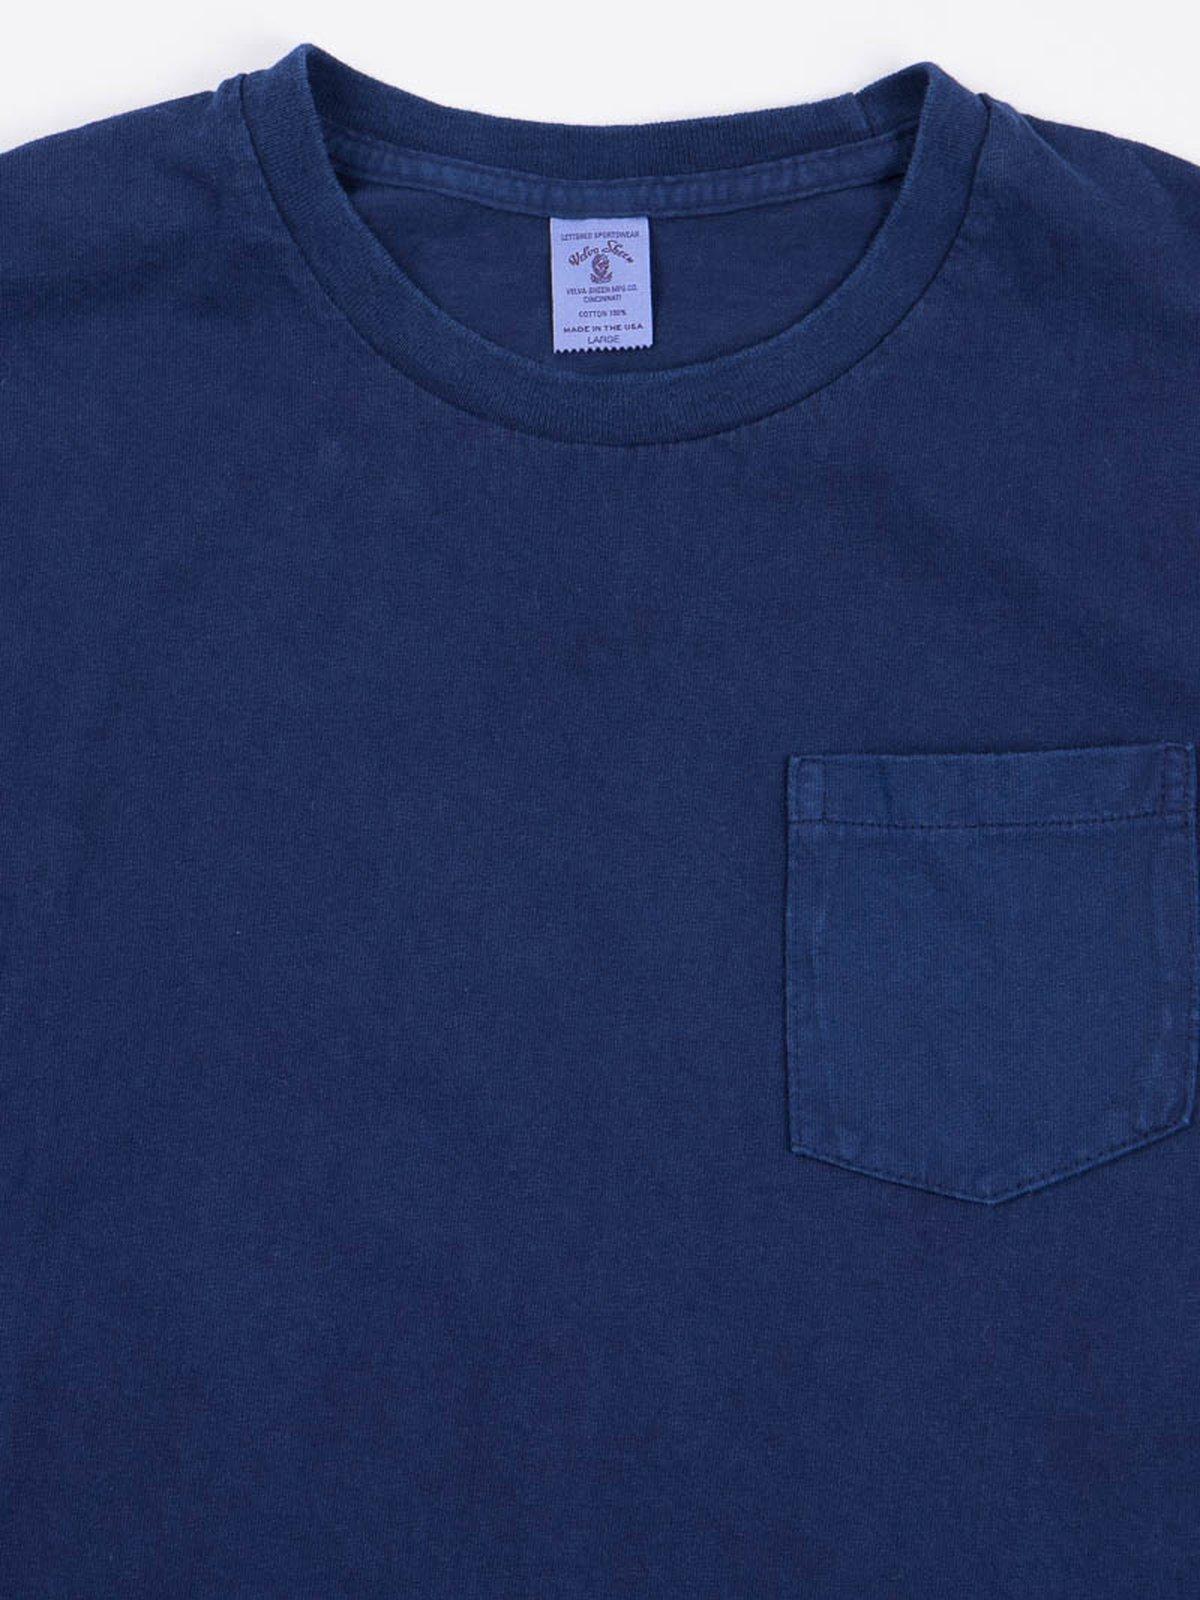 Blue Indigo 1–Pac Pocket Tee - Image 3